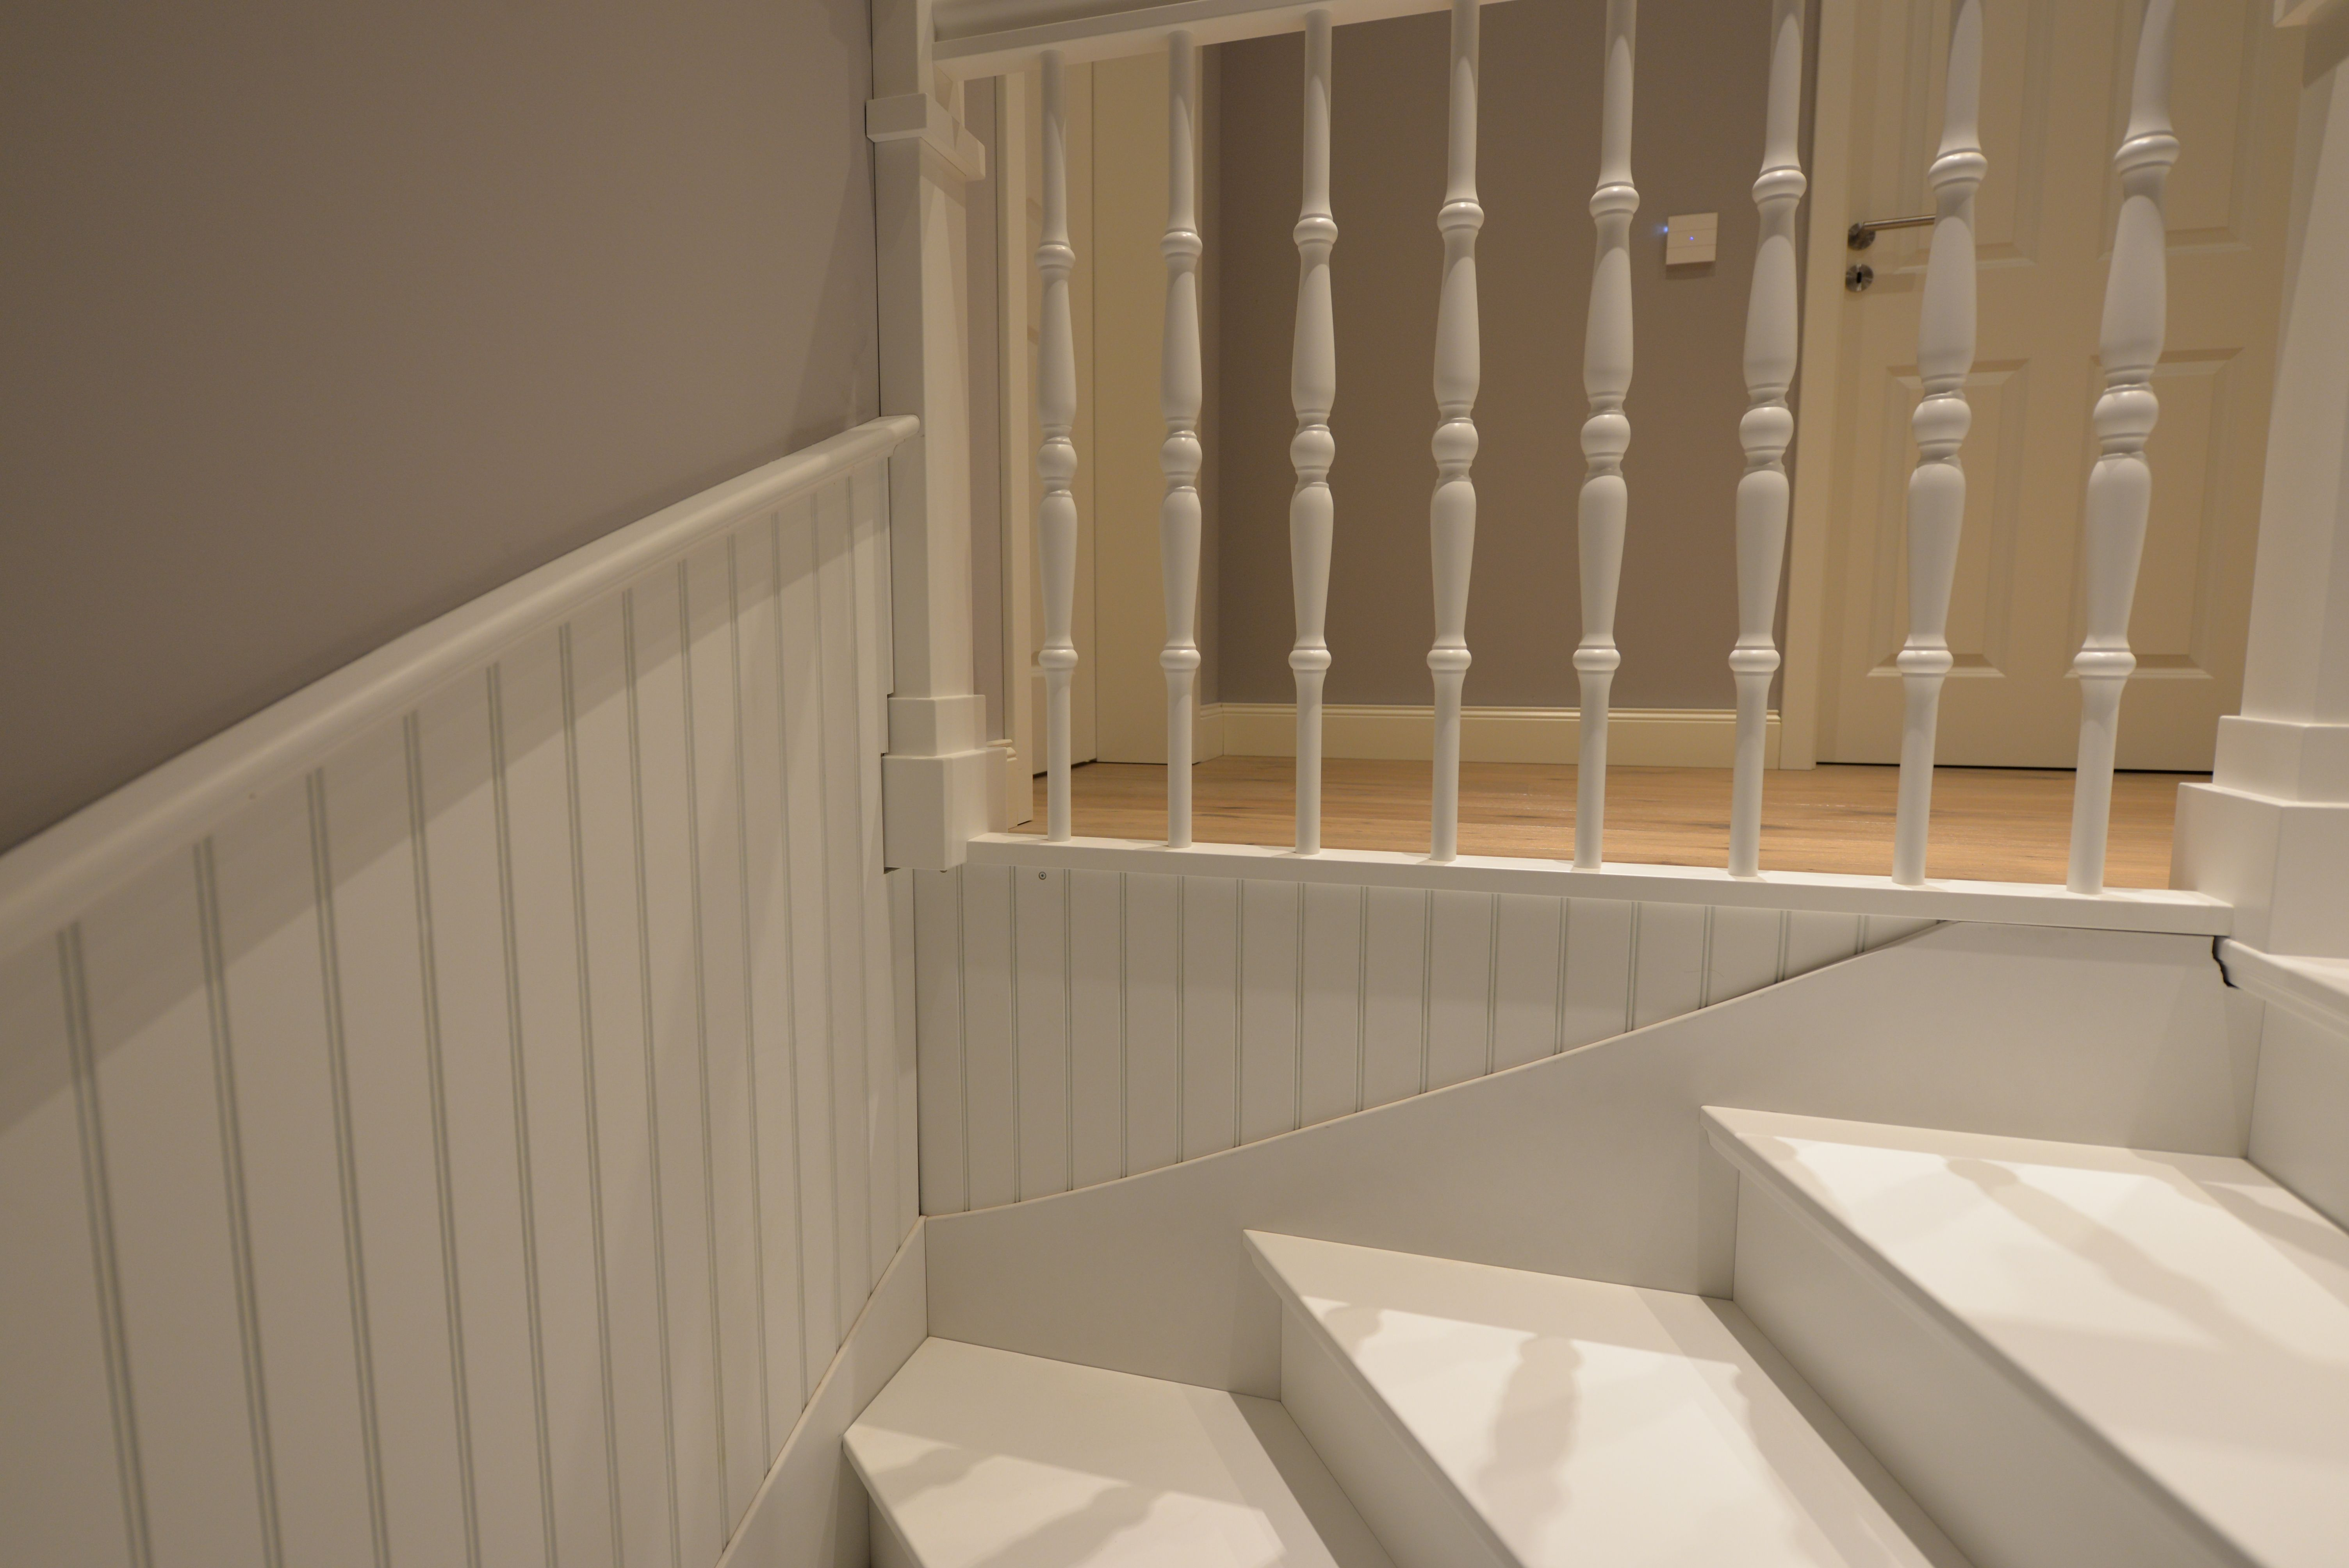 wandverkleidung holzpaneele treppenhaus treppenverkleidung holztreppe holzverkleidung schwedenhaus elevator